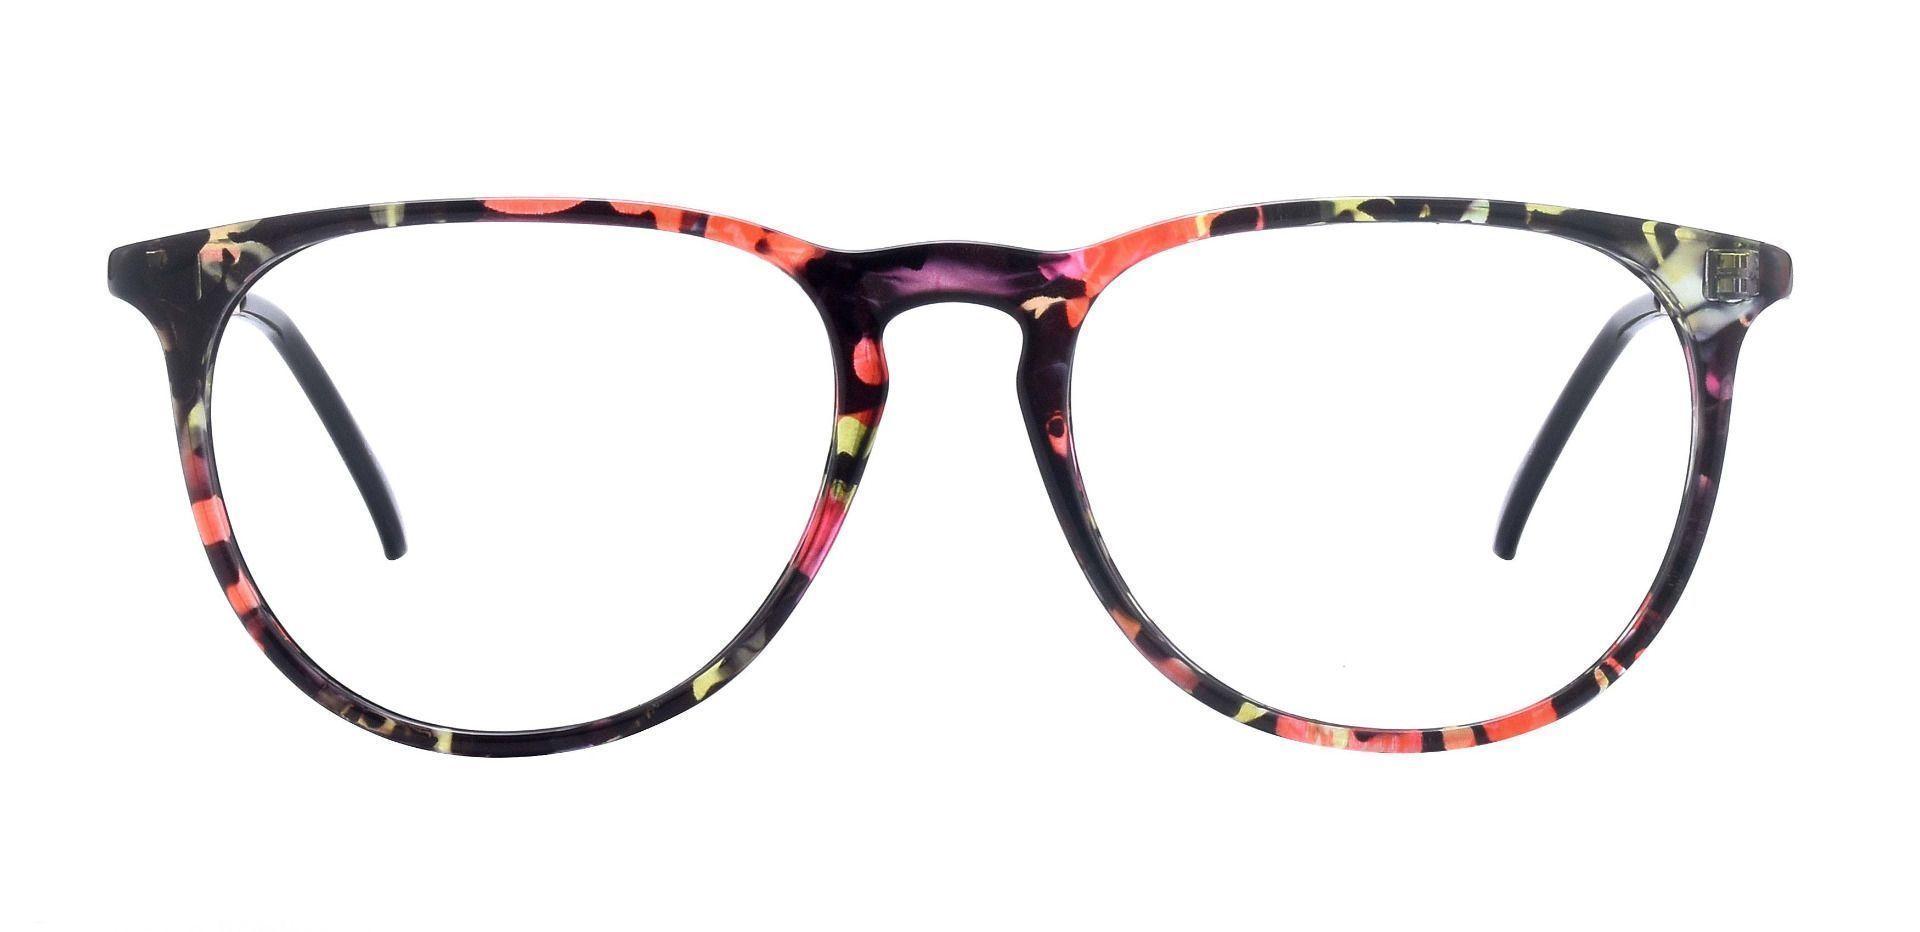 Harriett Oval Prescription Glasses - Floral